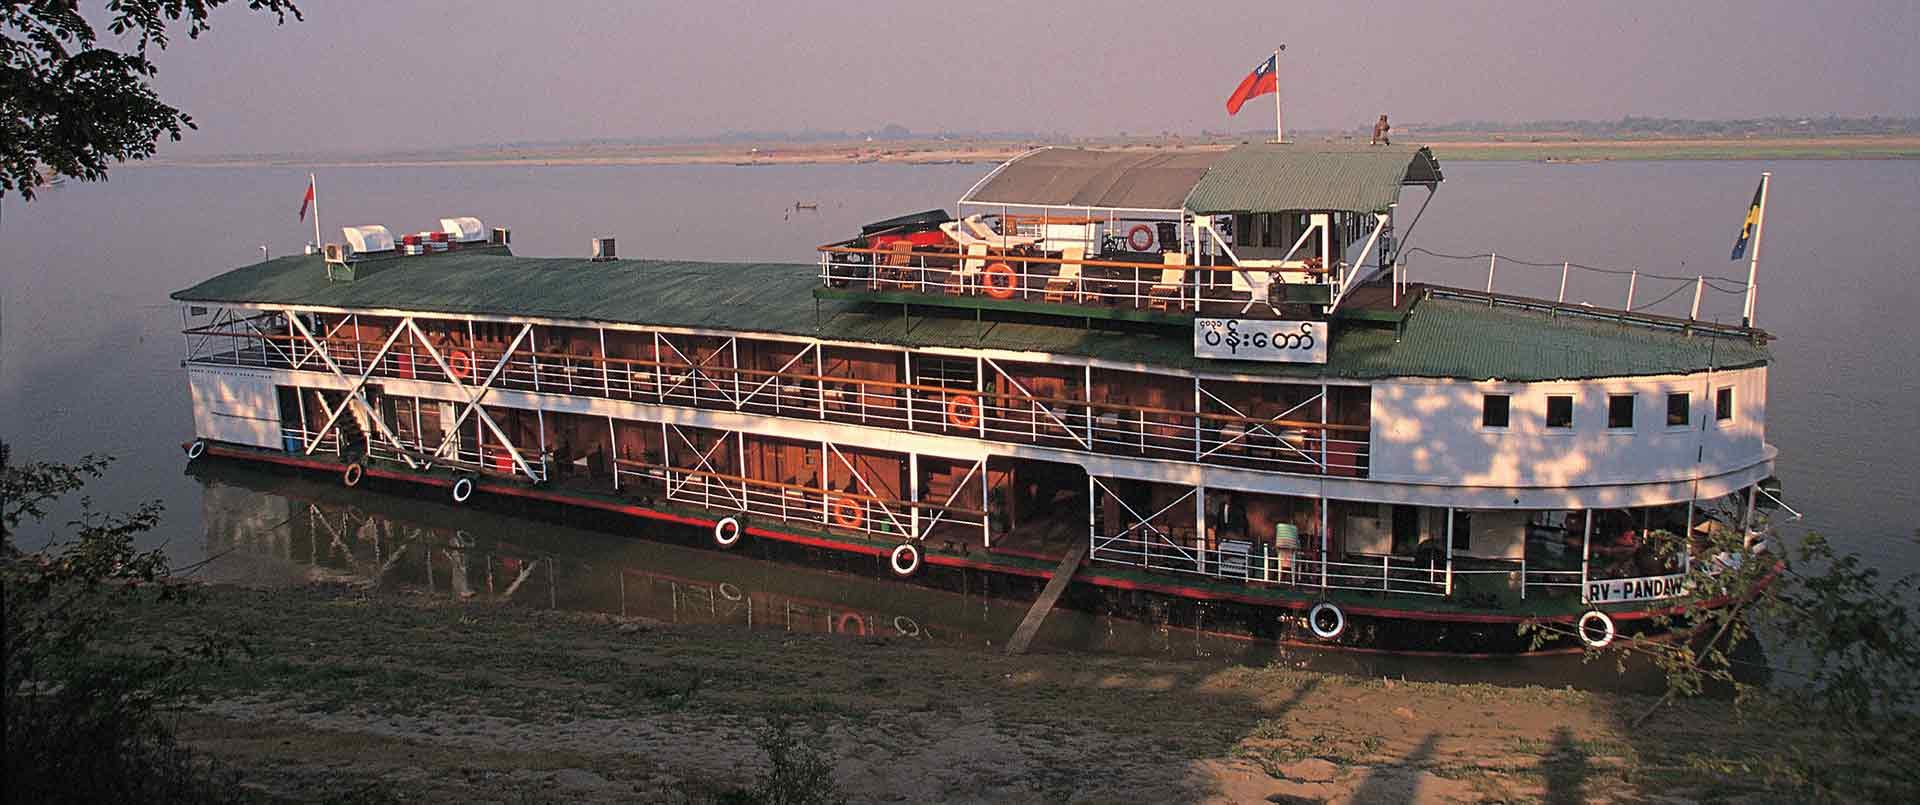 Pandaw River Cruises, Cambodia